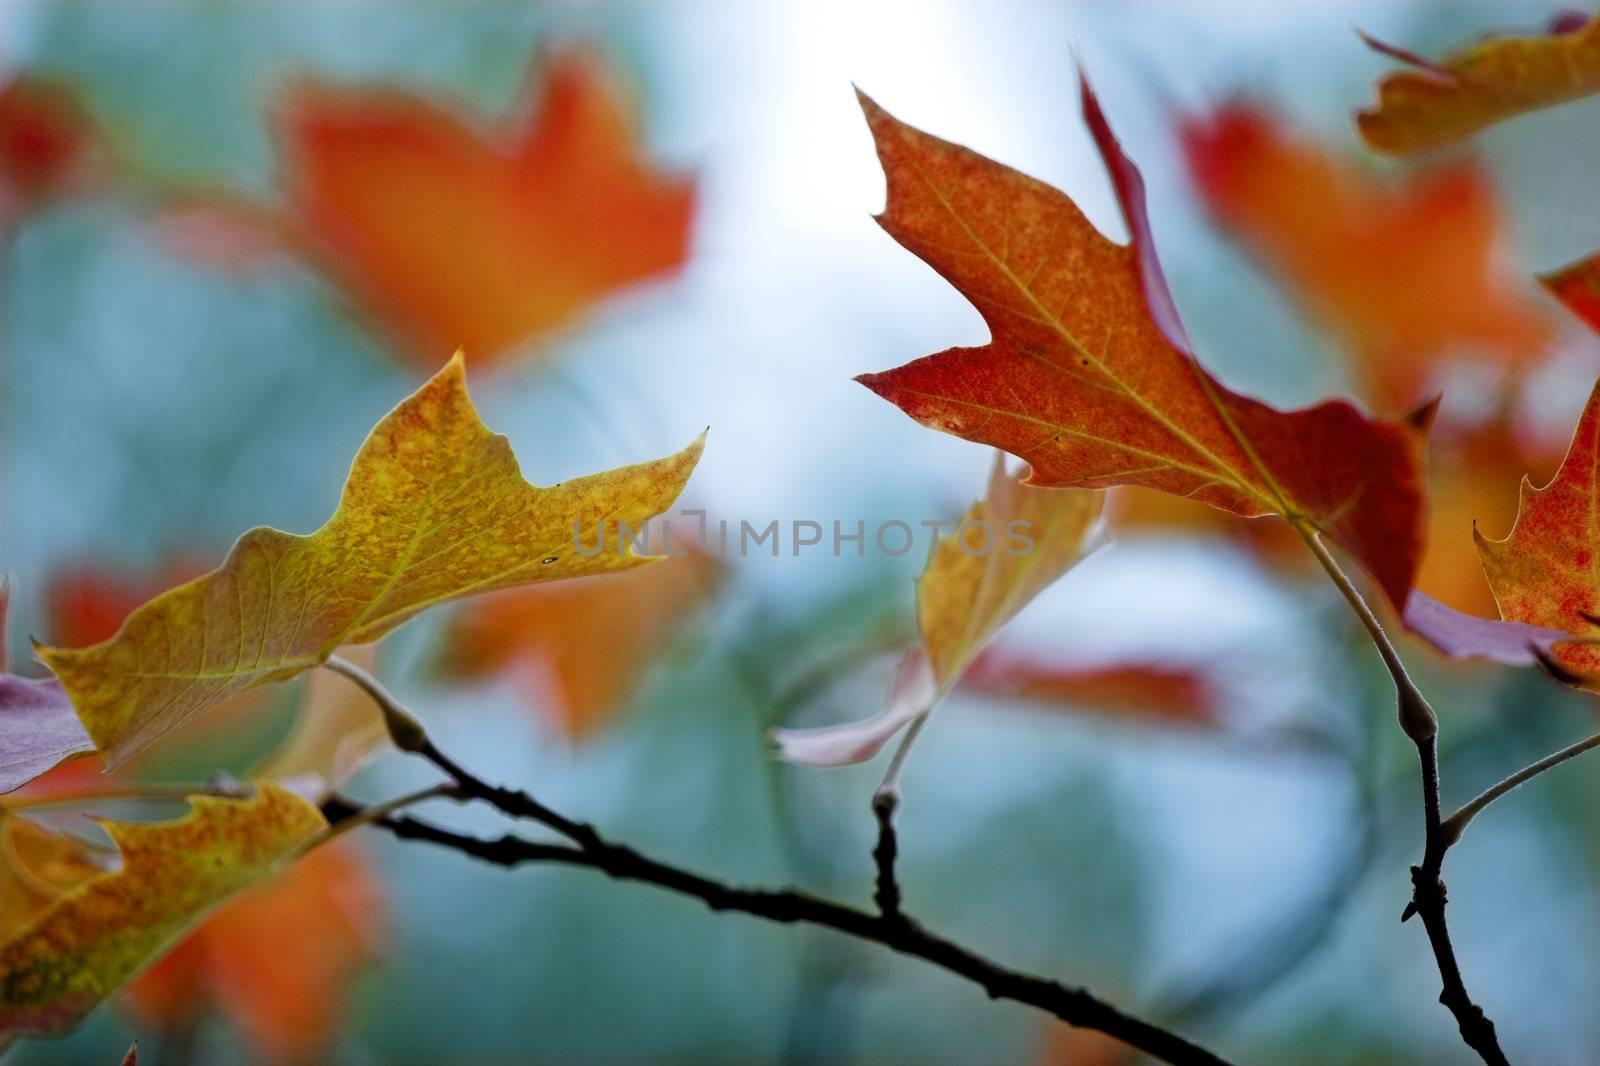 Fall leaves by Iko